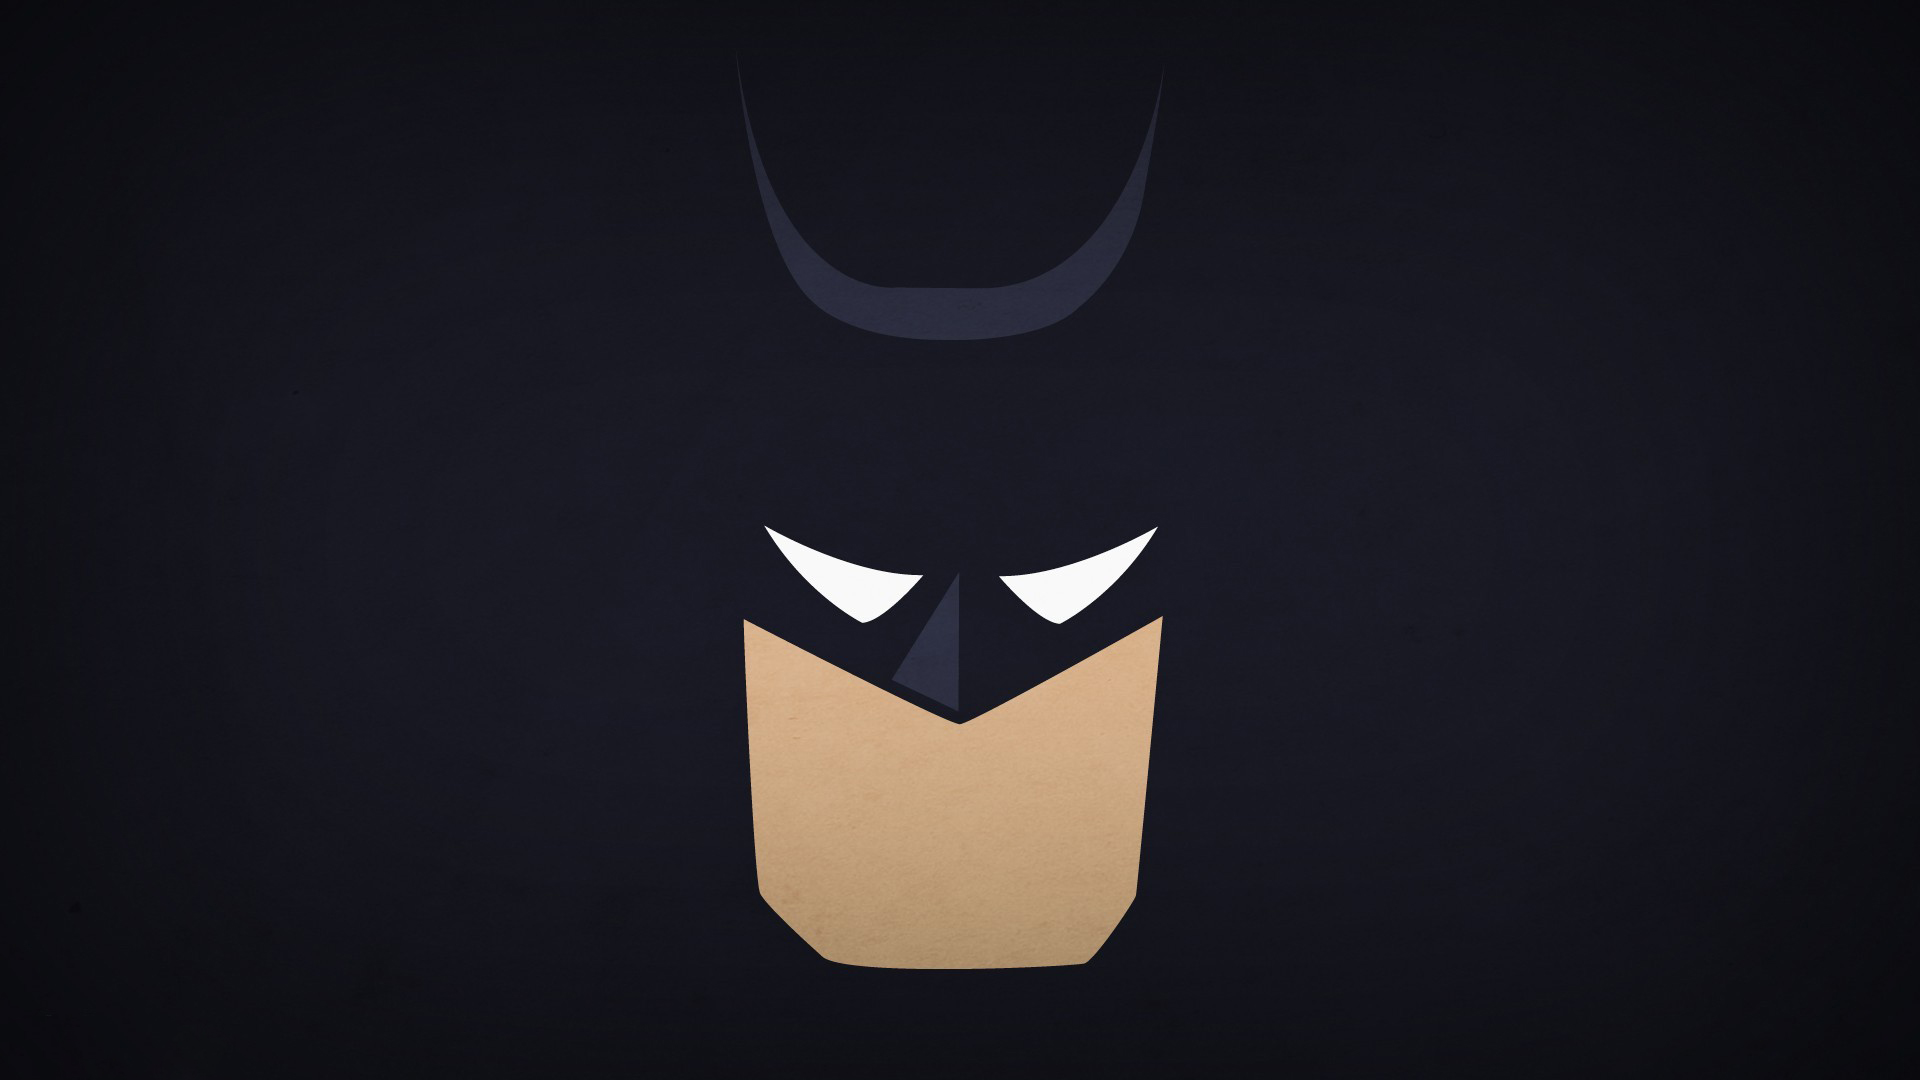 Batman HD Wallpapers for Desktop 3 1920x1080